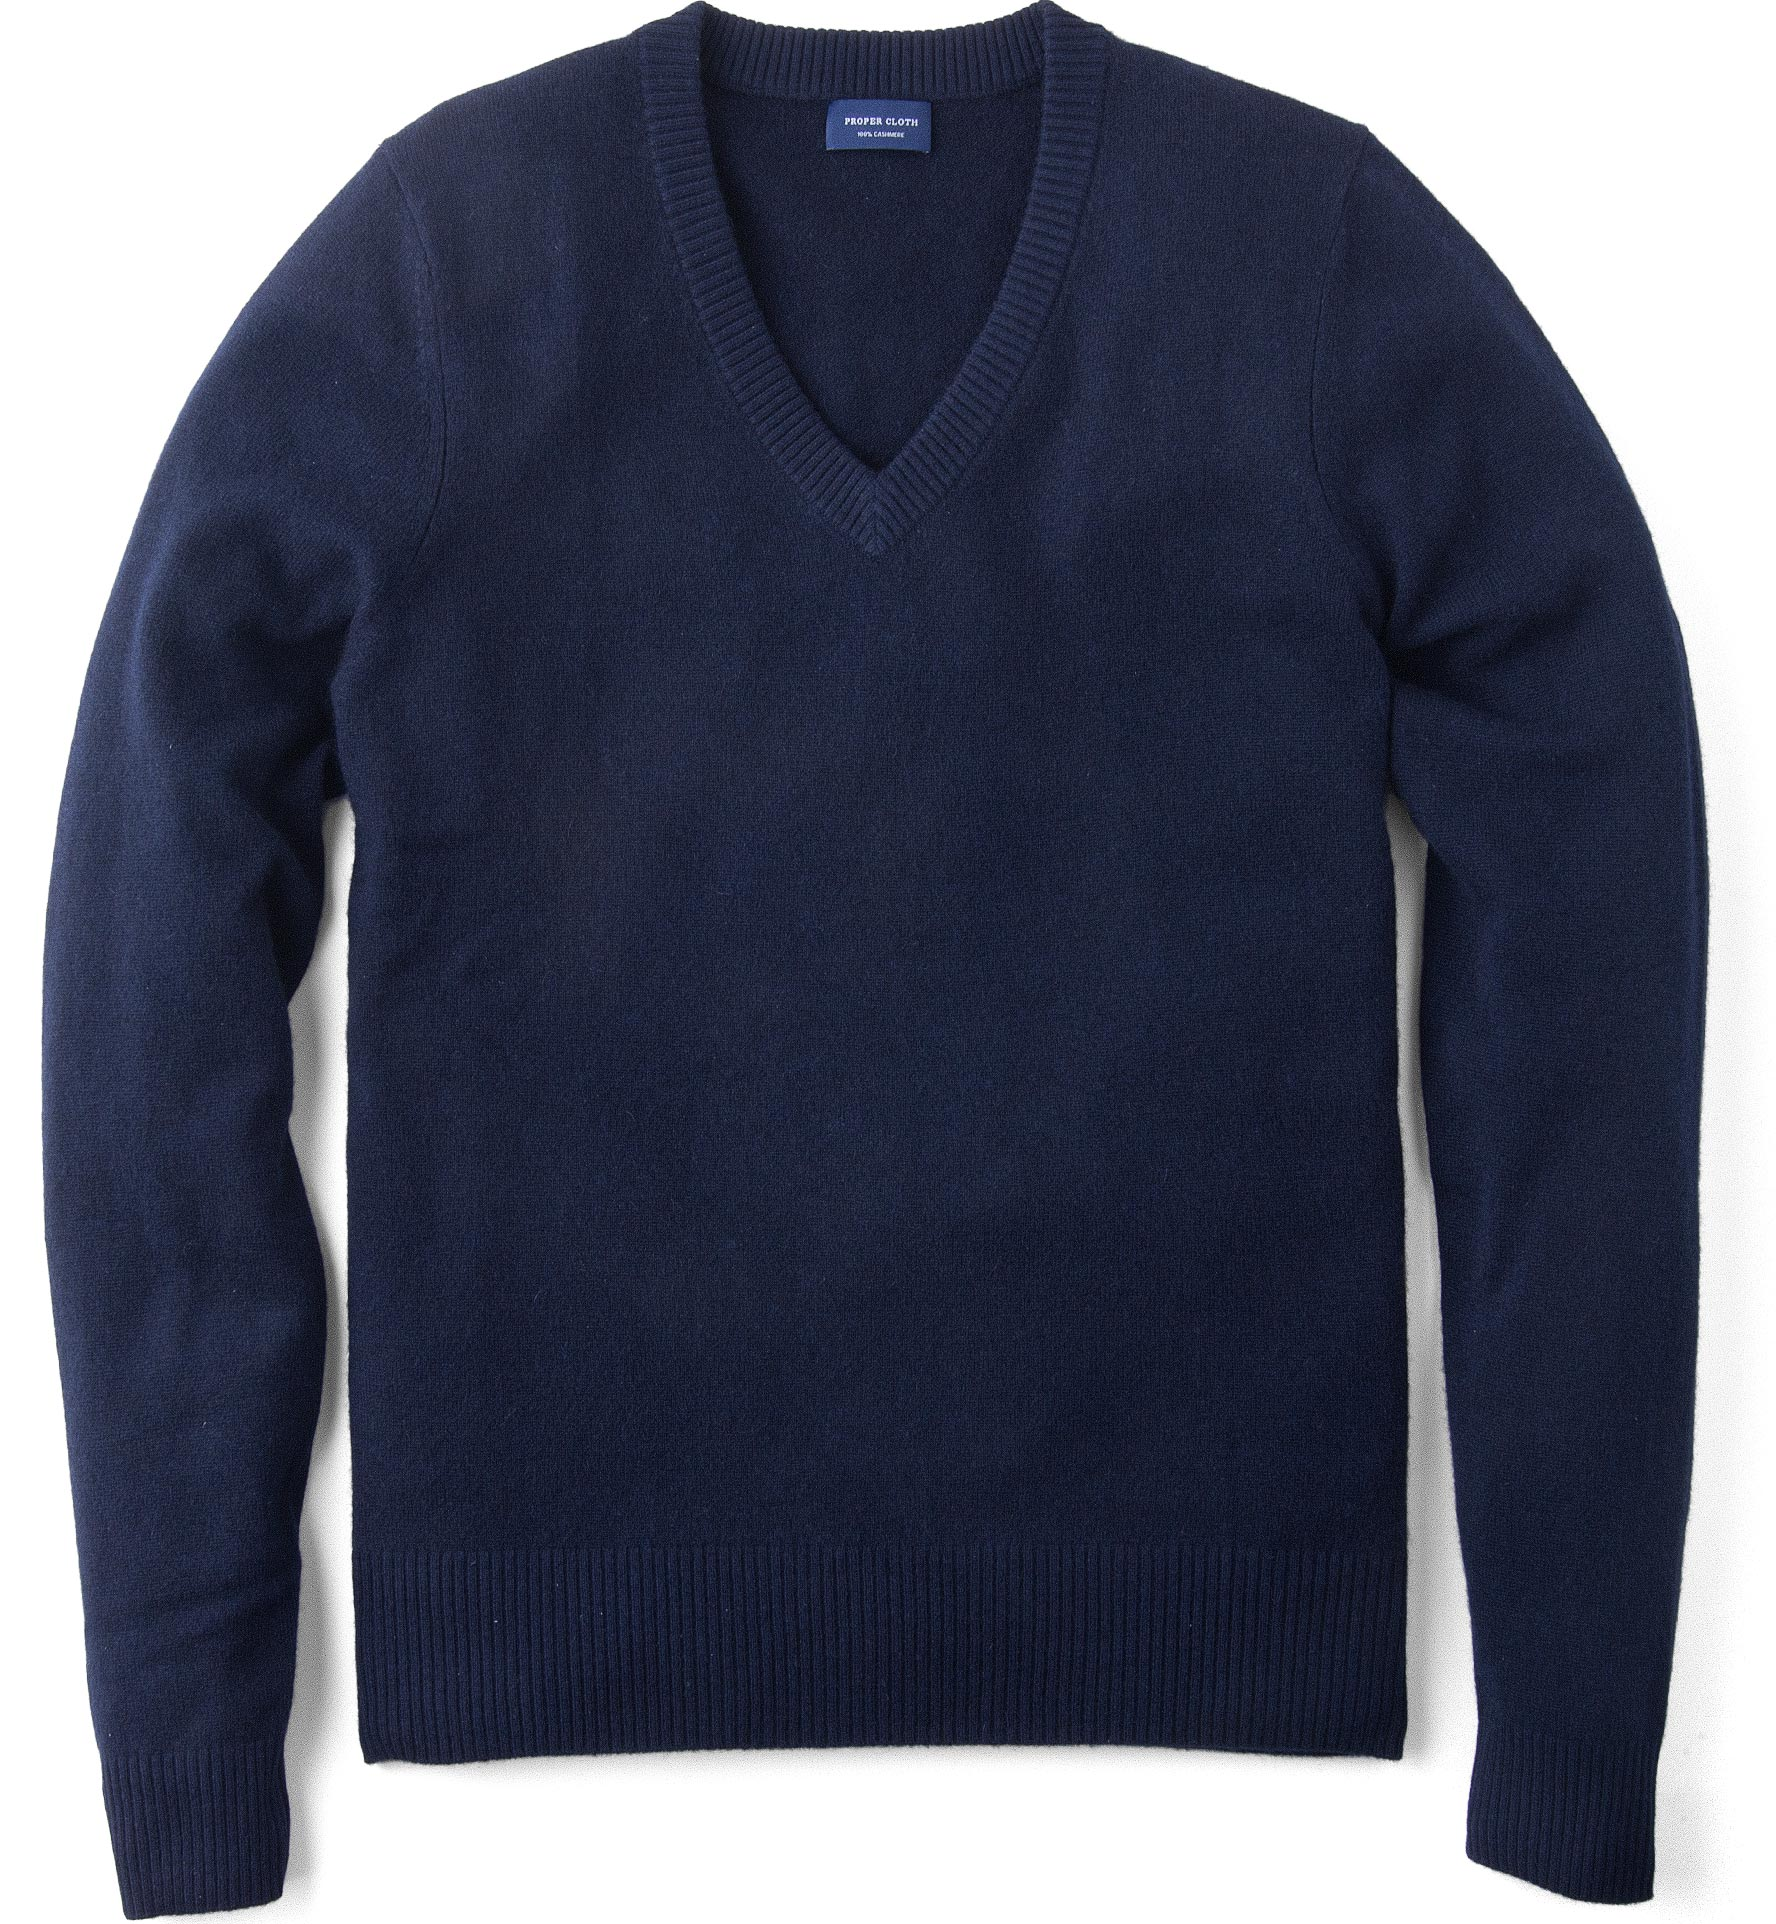 Zoom Image of Navy Cashmere V-Neck Sweater